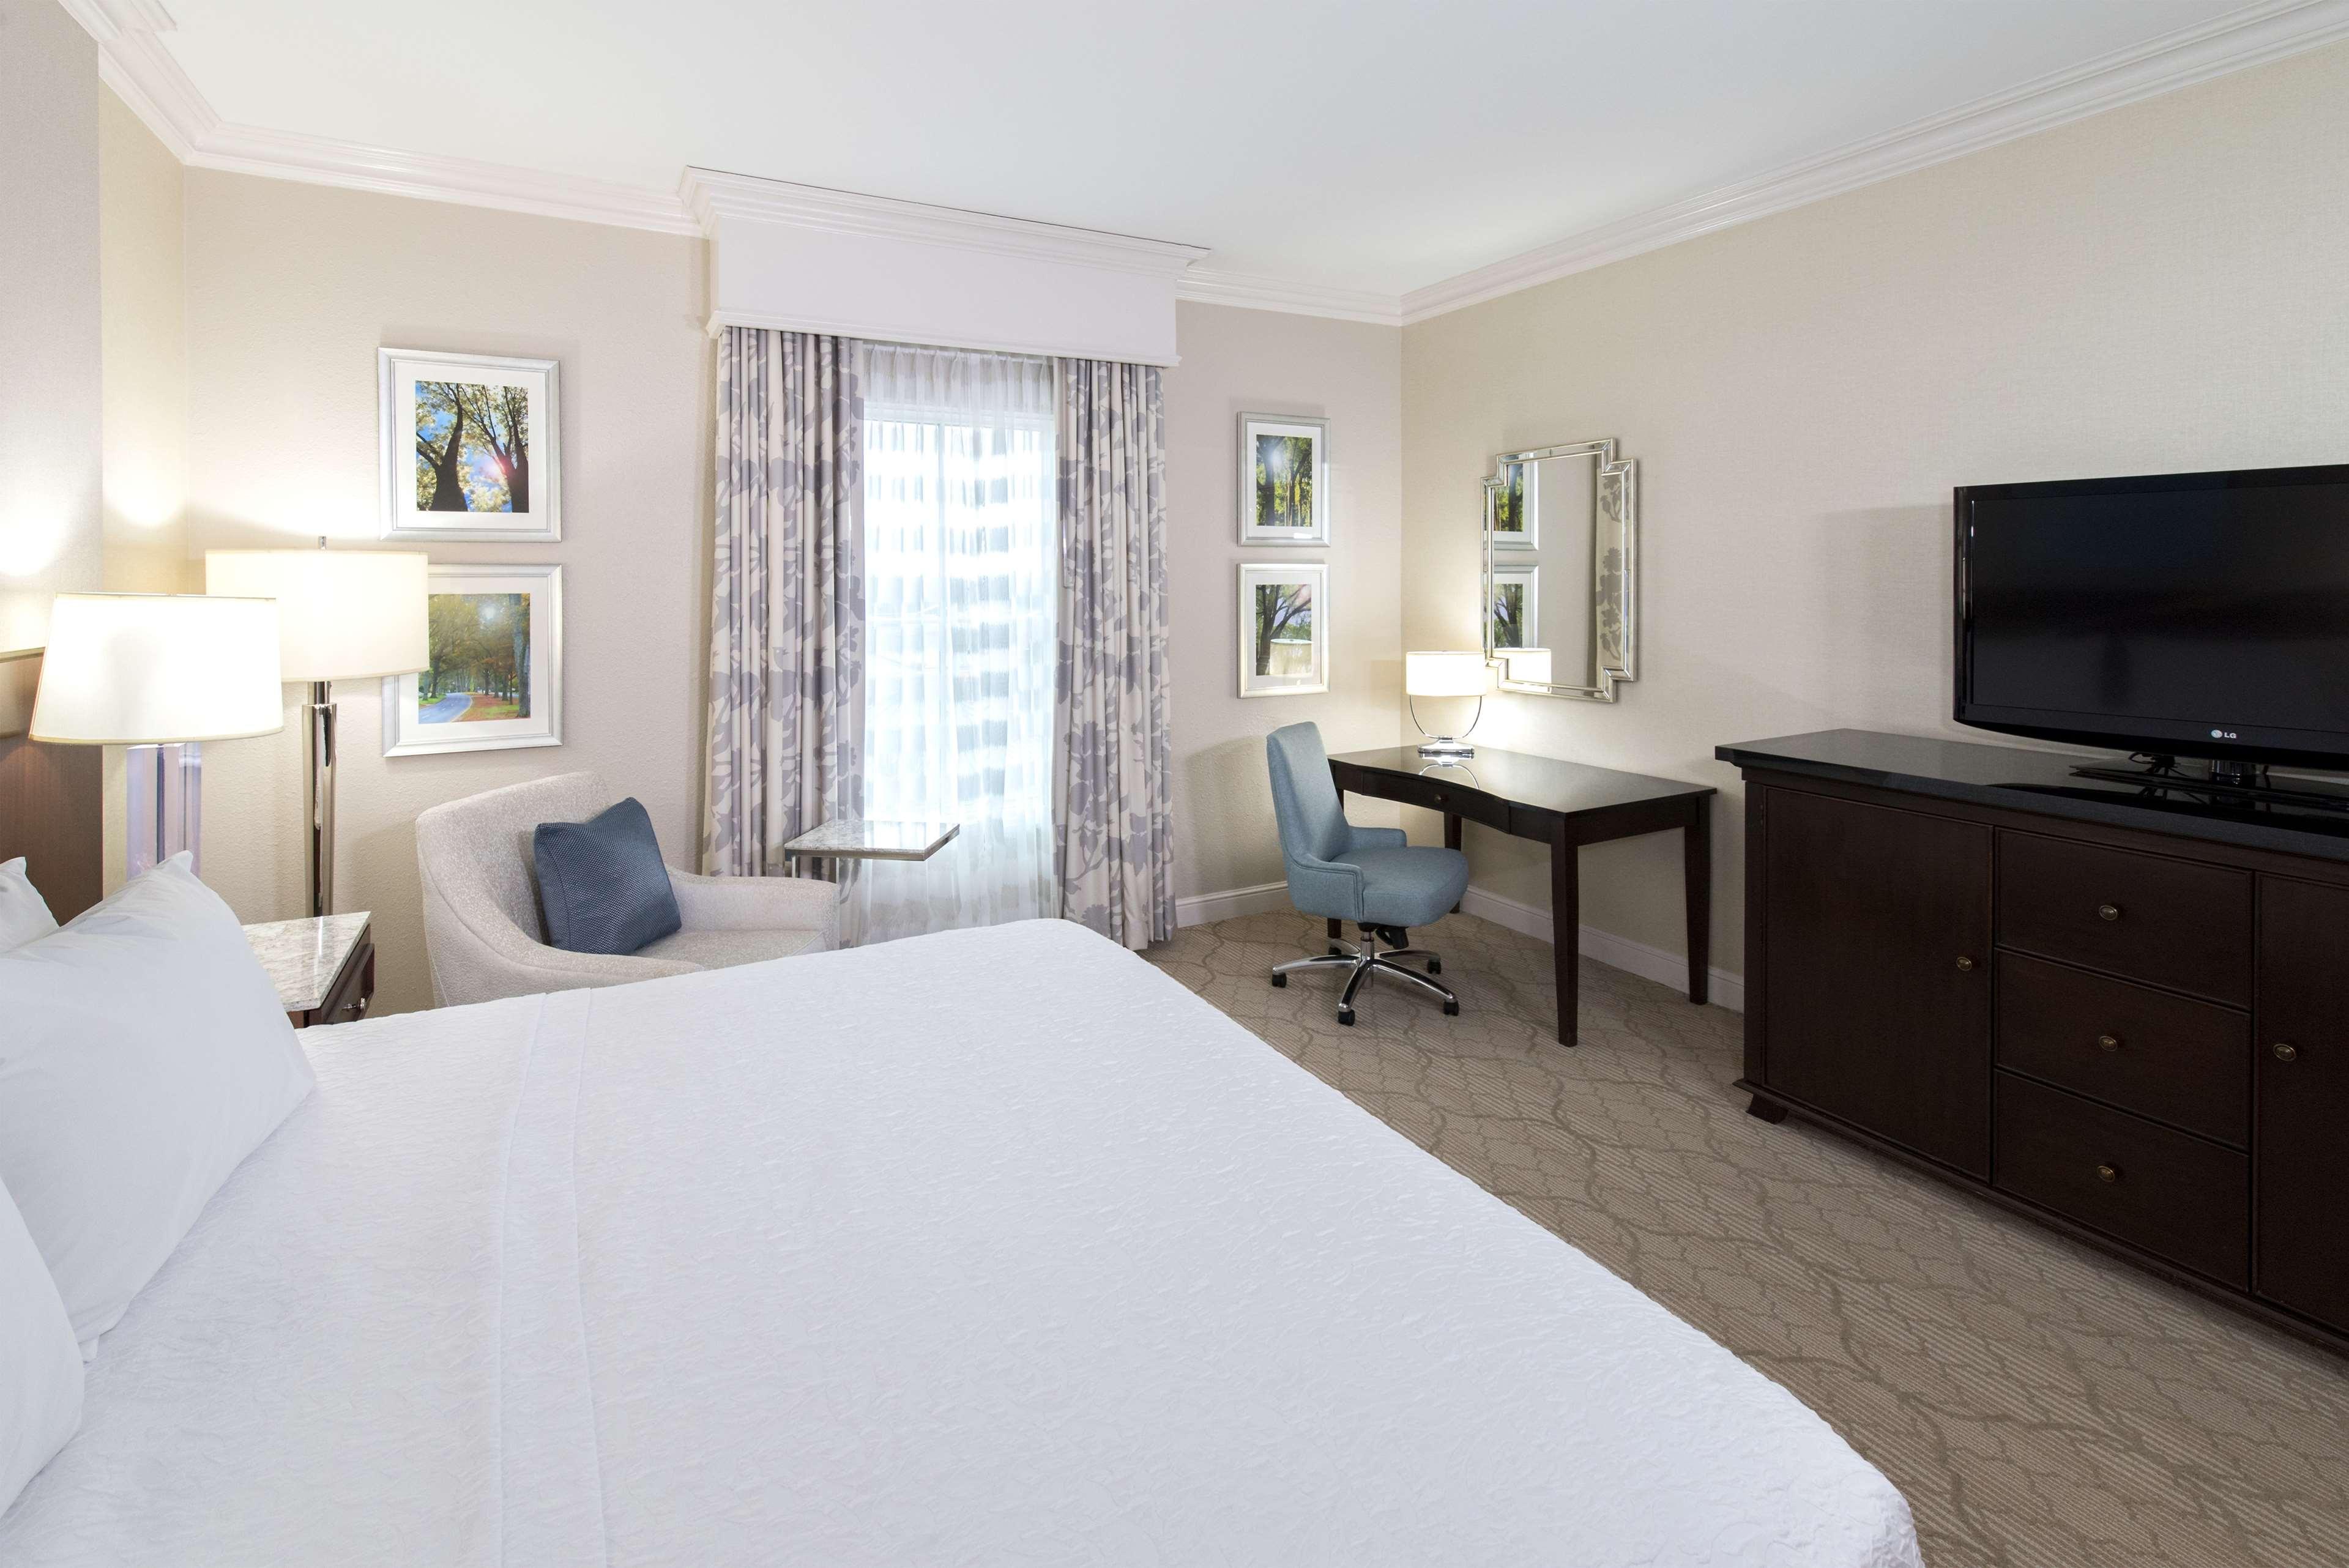 Hampton Inn & Suites Charlotte/South Park at Phillips Place image 25